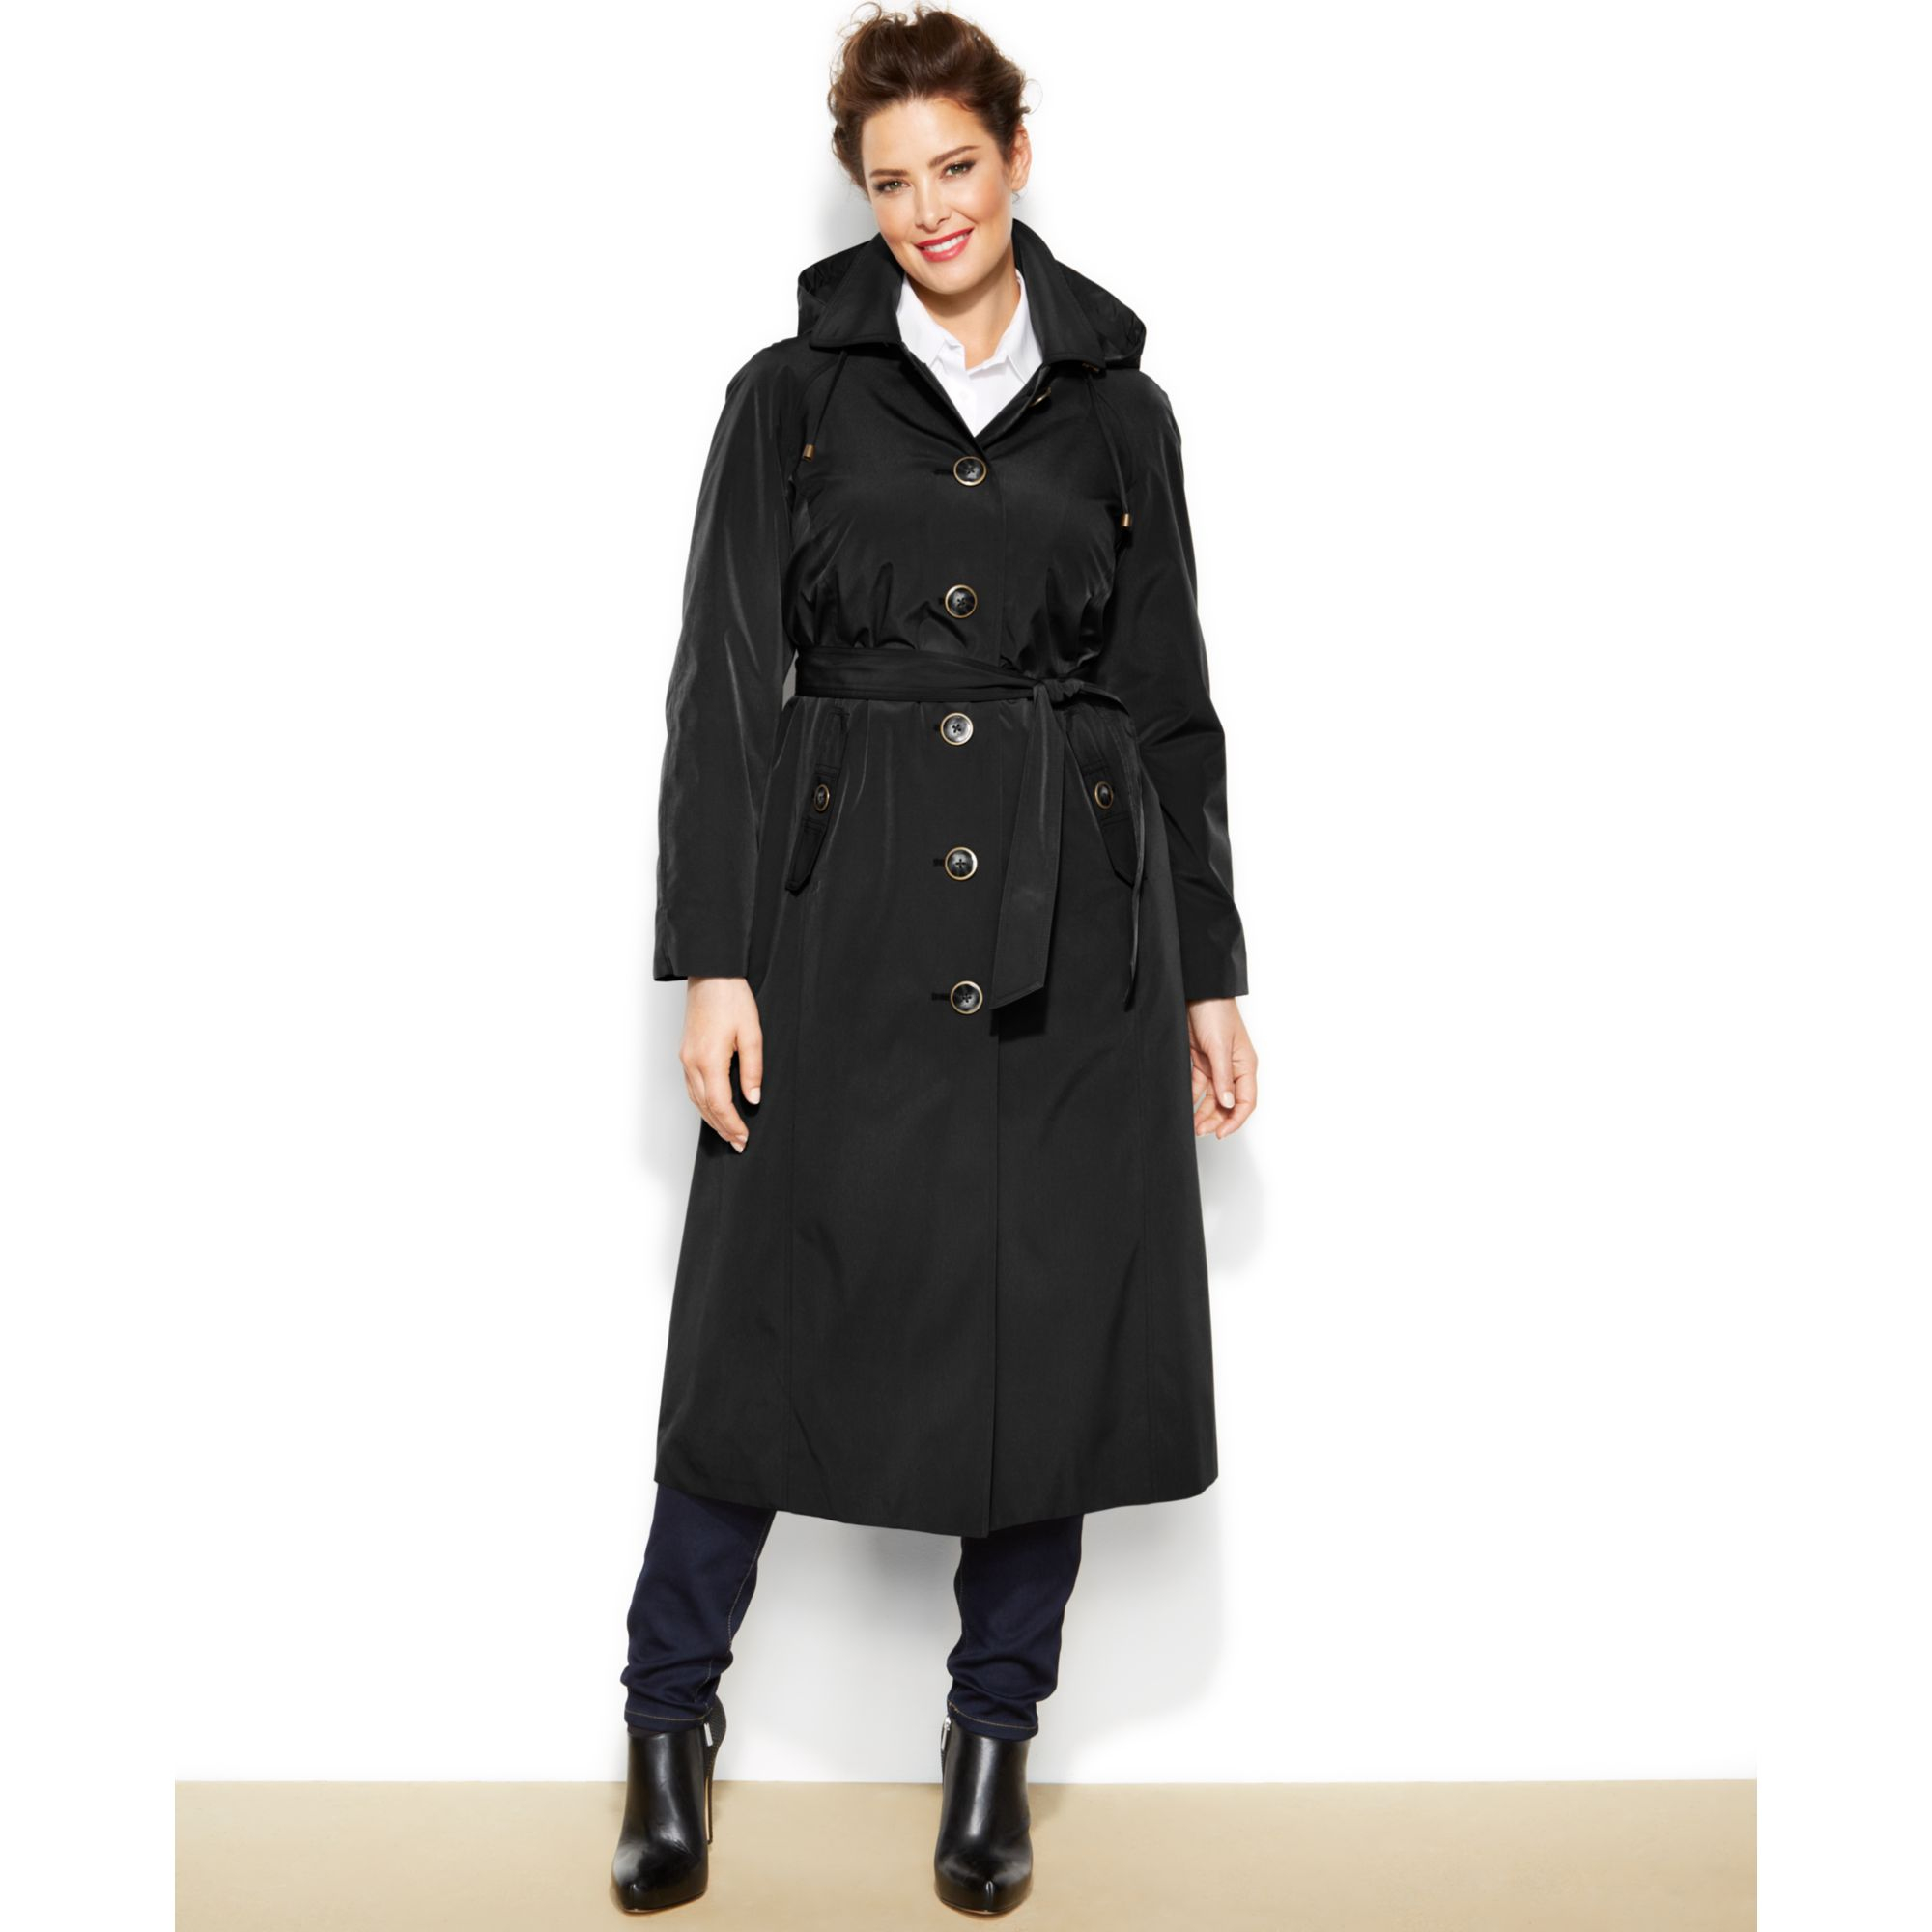 London Fog Plus Size Long Trench Coat in Black - Lyst